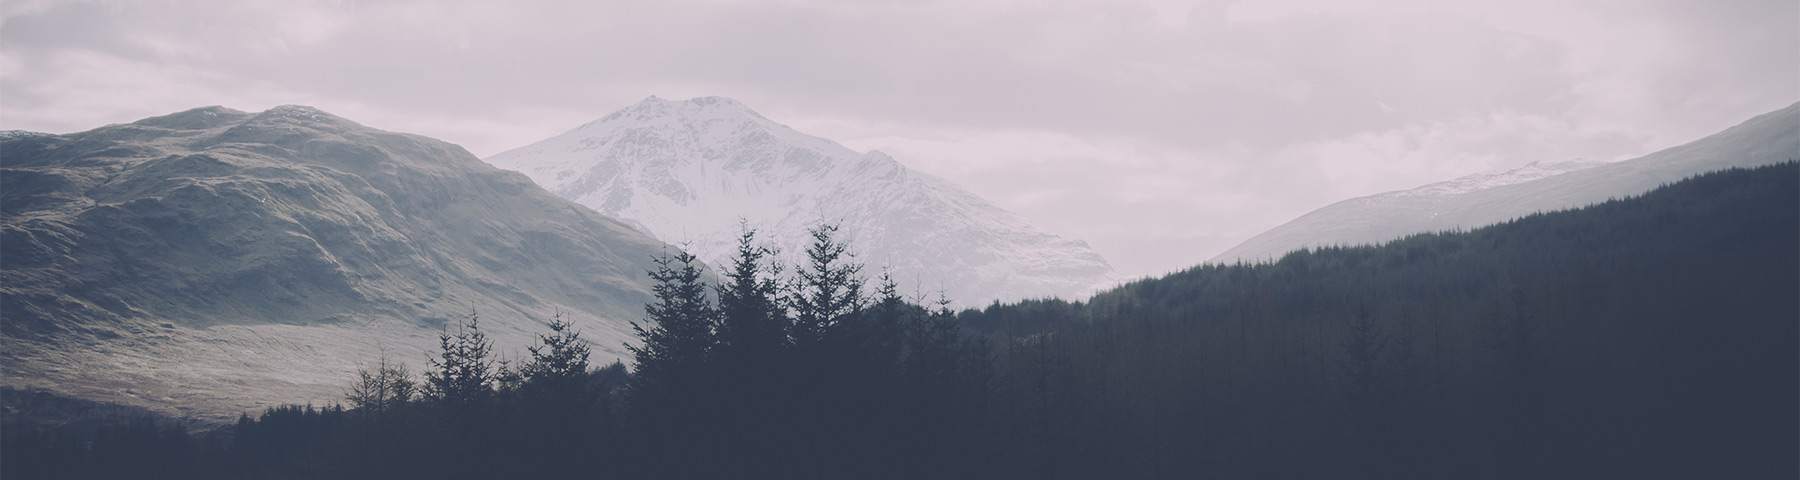 pano-scotland-mountains